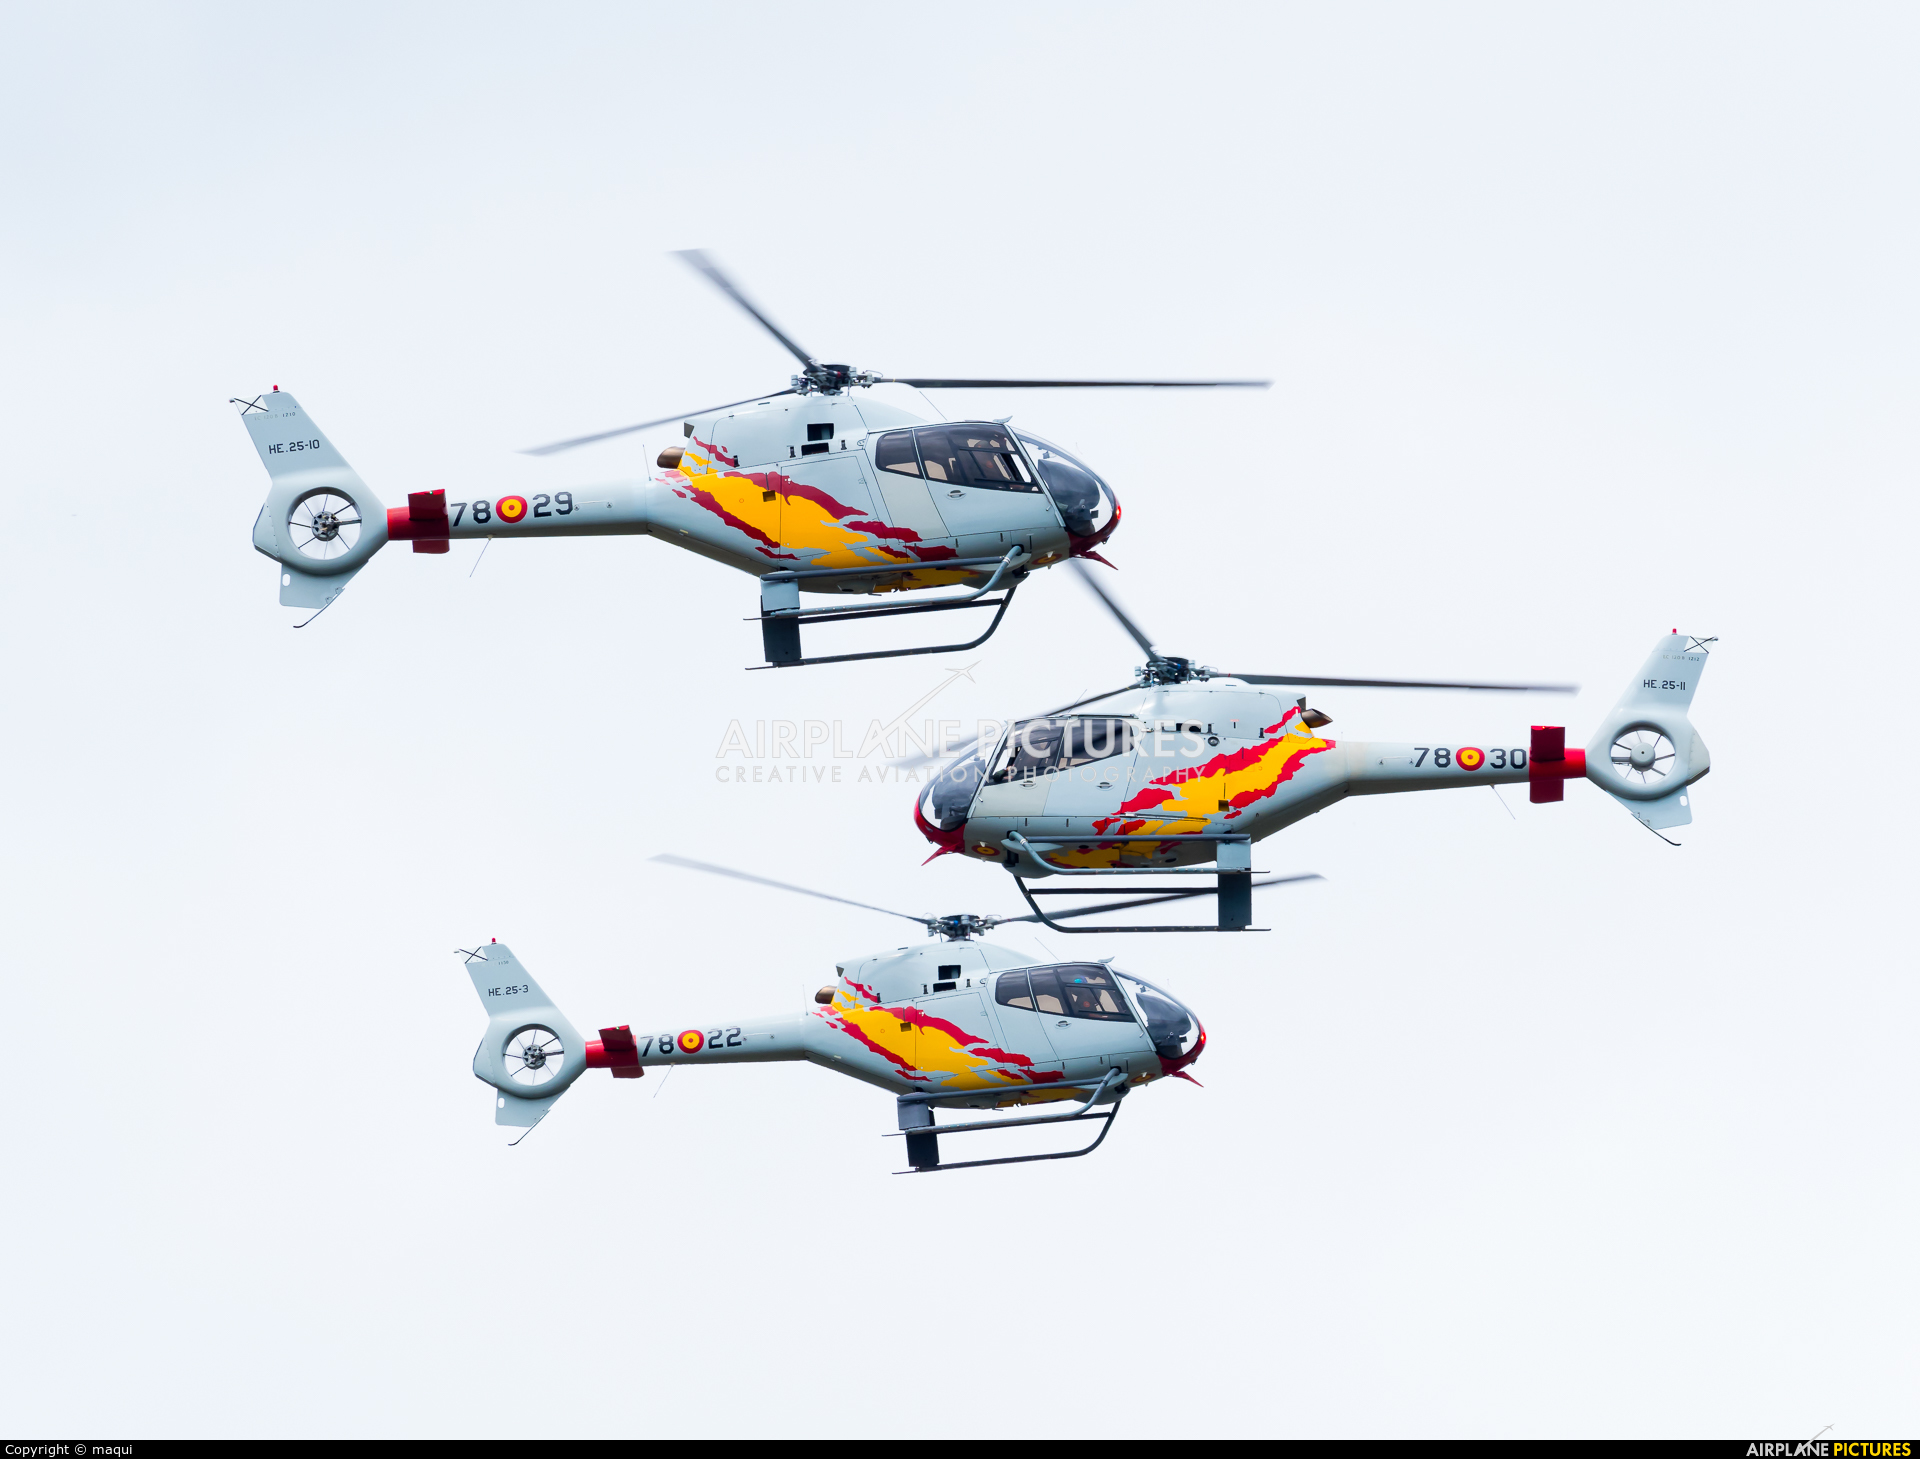 Spain - Air Force: Patrulla ASPA HE.25-11 aircraft at Lugo - Rozas